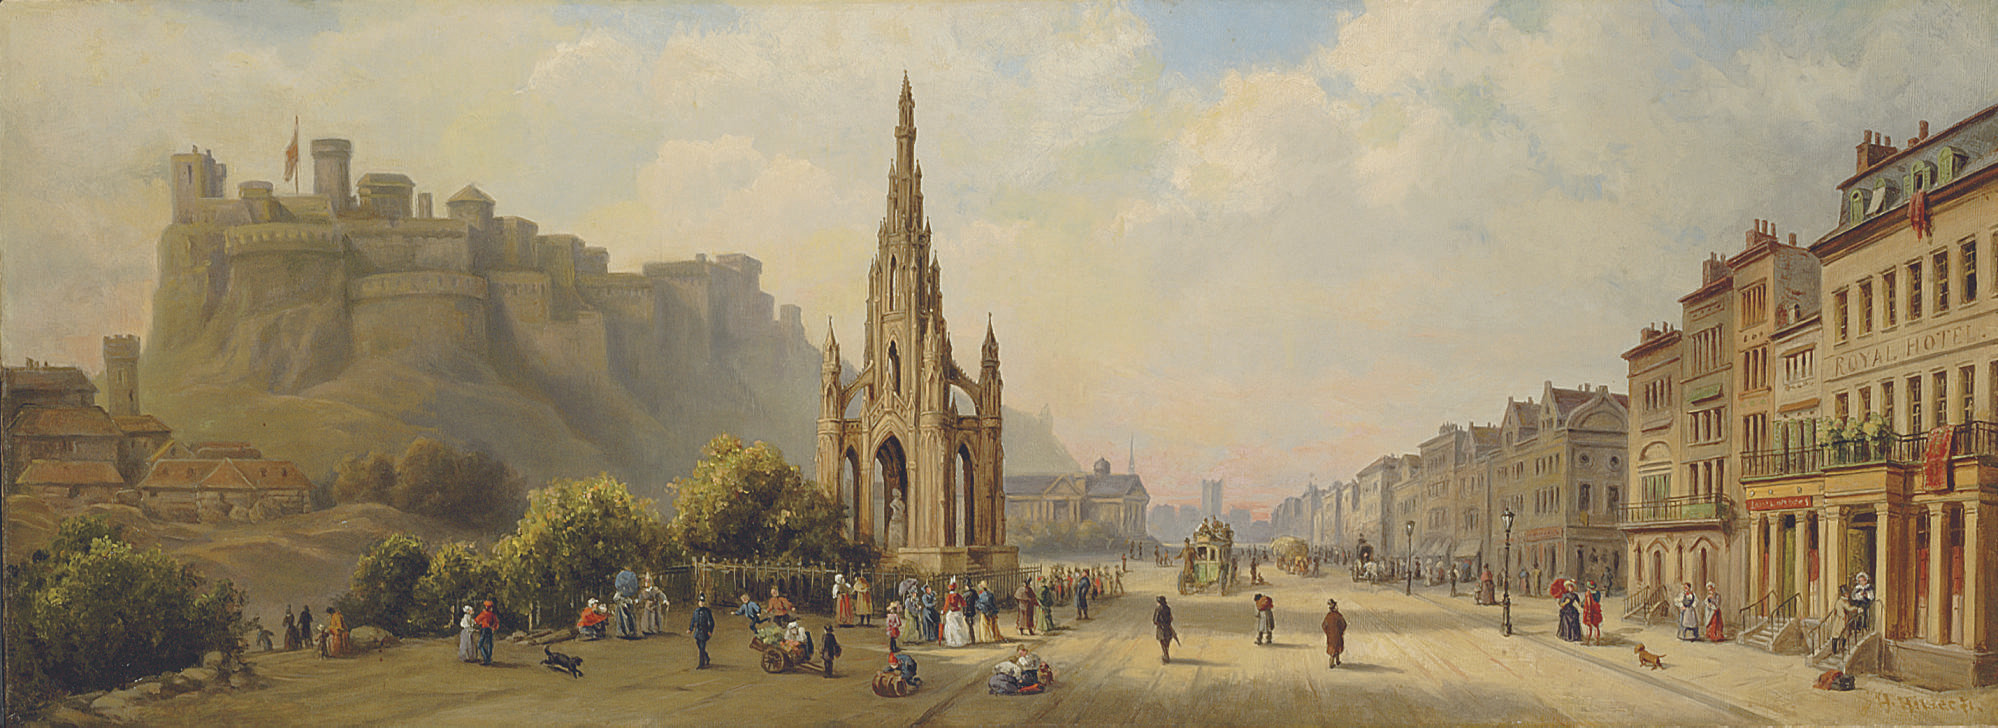 The Scott Monument, Prince's Street, Edinburgh